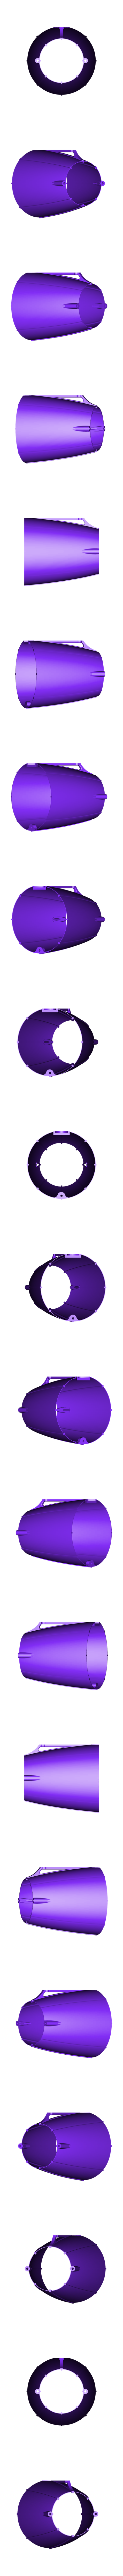 zep03.stl Download free STL file Battle zeppelin lamp • 3D print design, vd_max